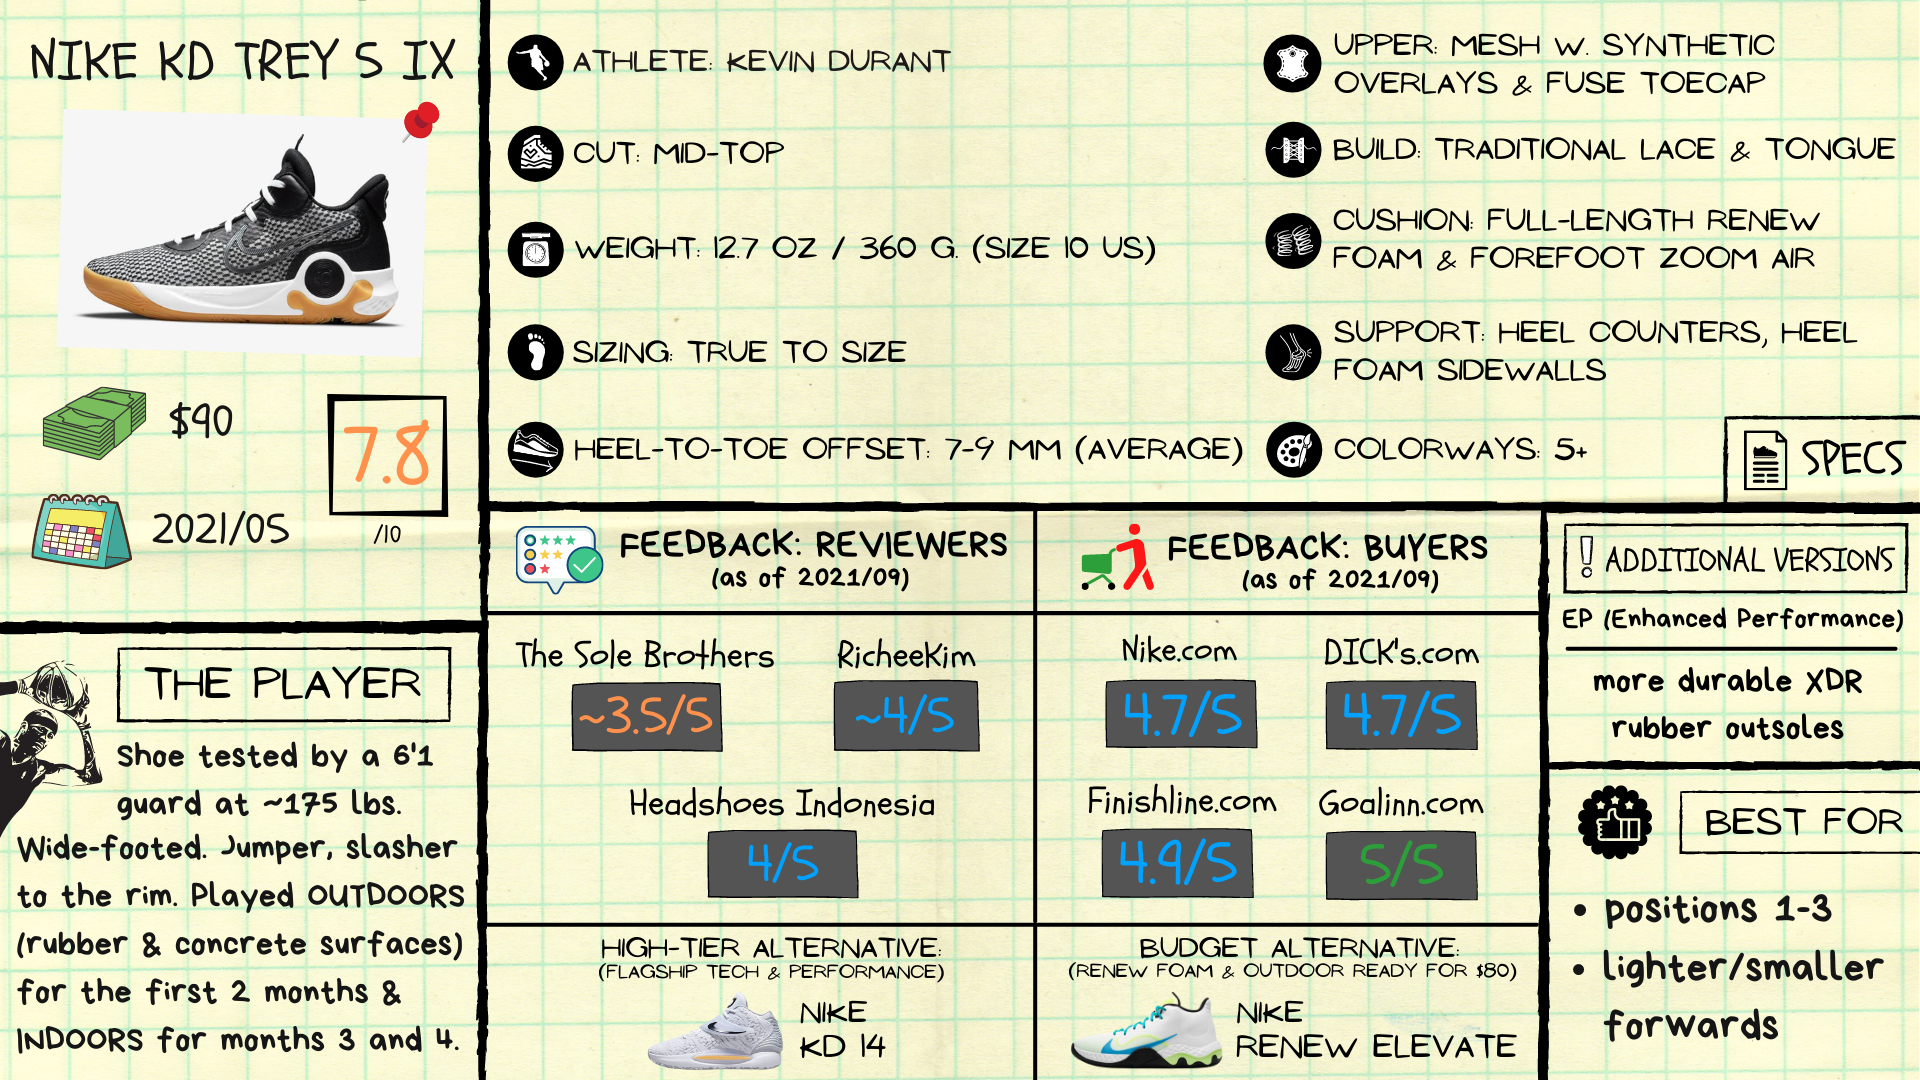 KD Trey 5 IX Review: Spec Sheet